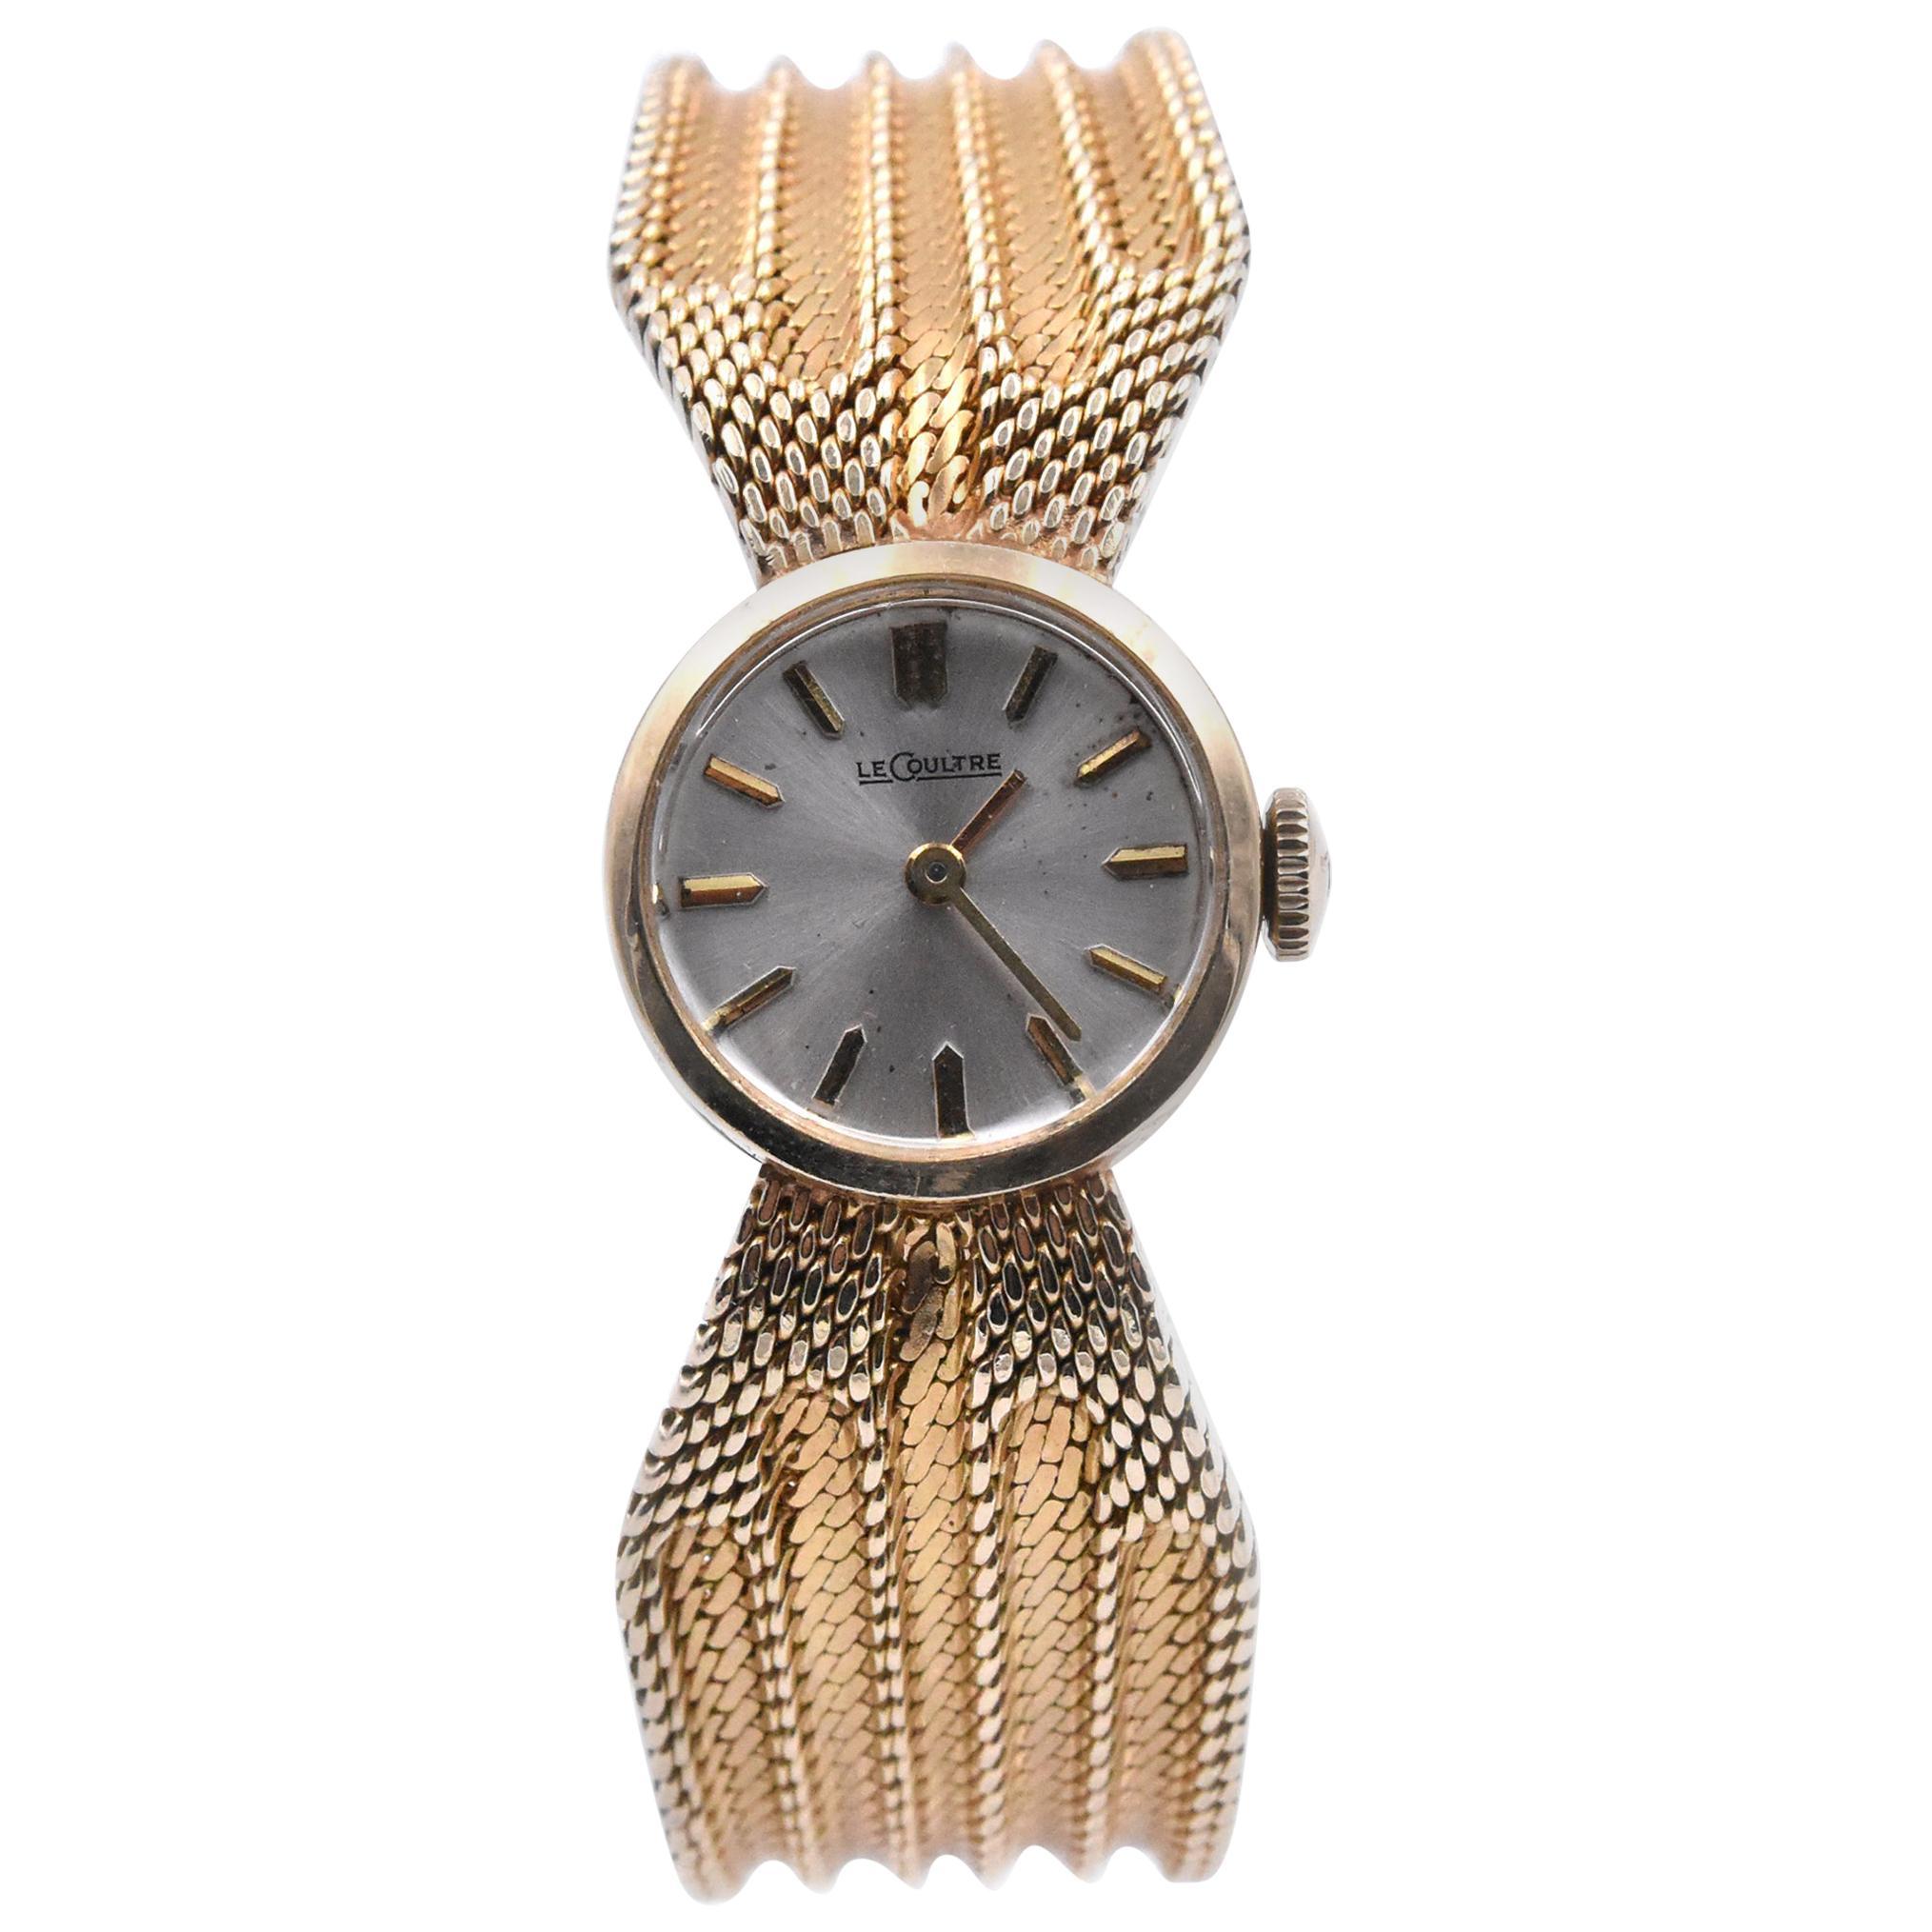 Jaeger-LeCoultre 14 Karat Yellow Gold Ladies Dress Watch